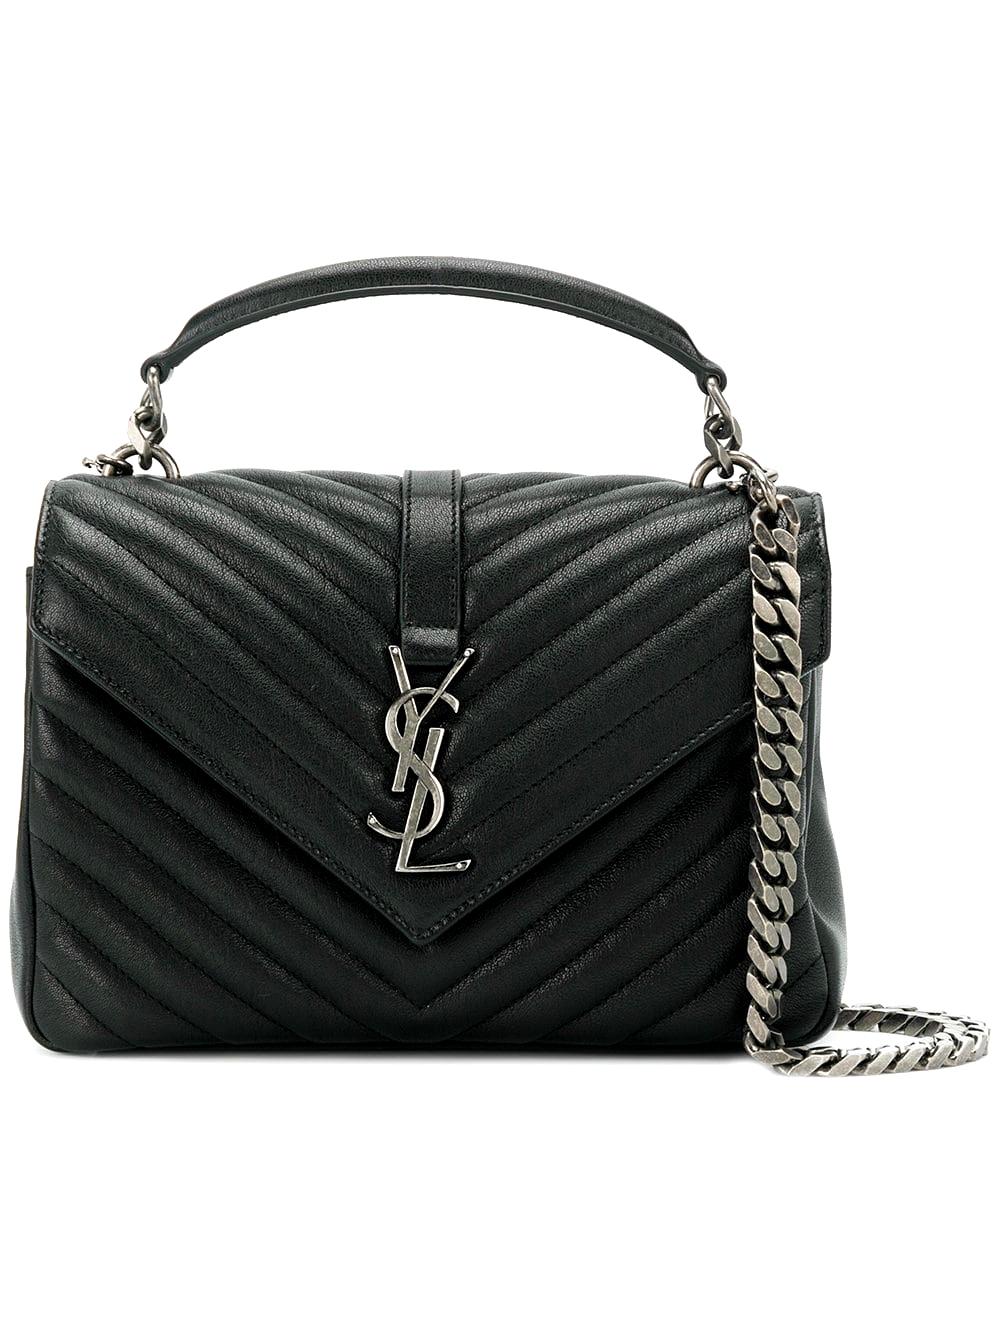 Ysl Bags Sale Ysl Bags Ysl Crossbody Bag Ysl Bags Uk Ysl